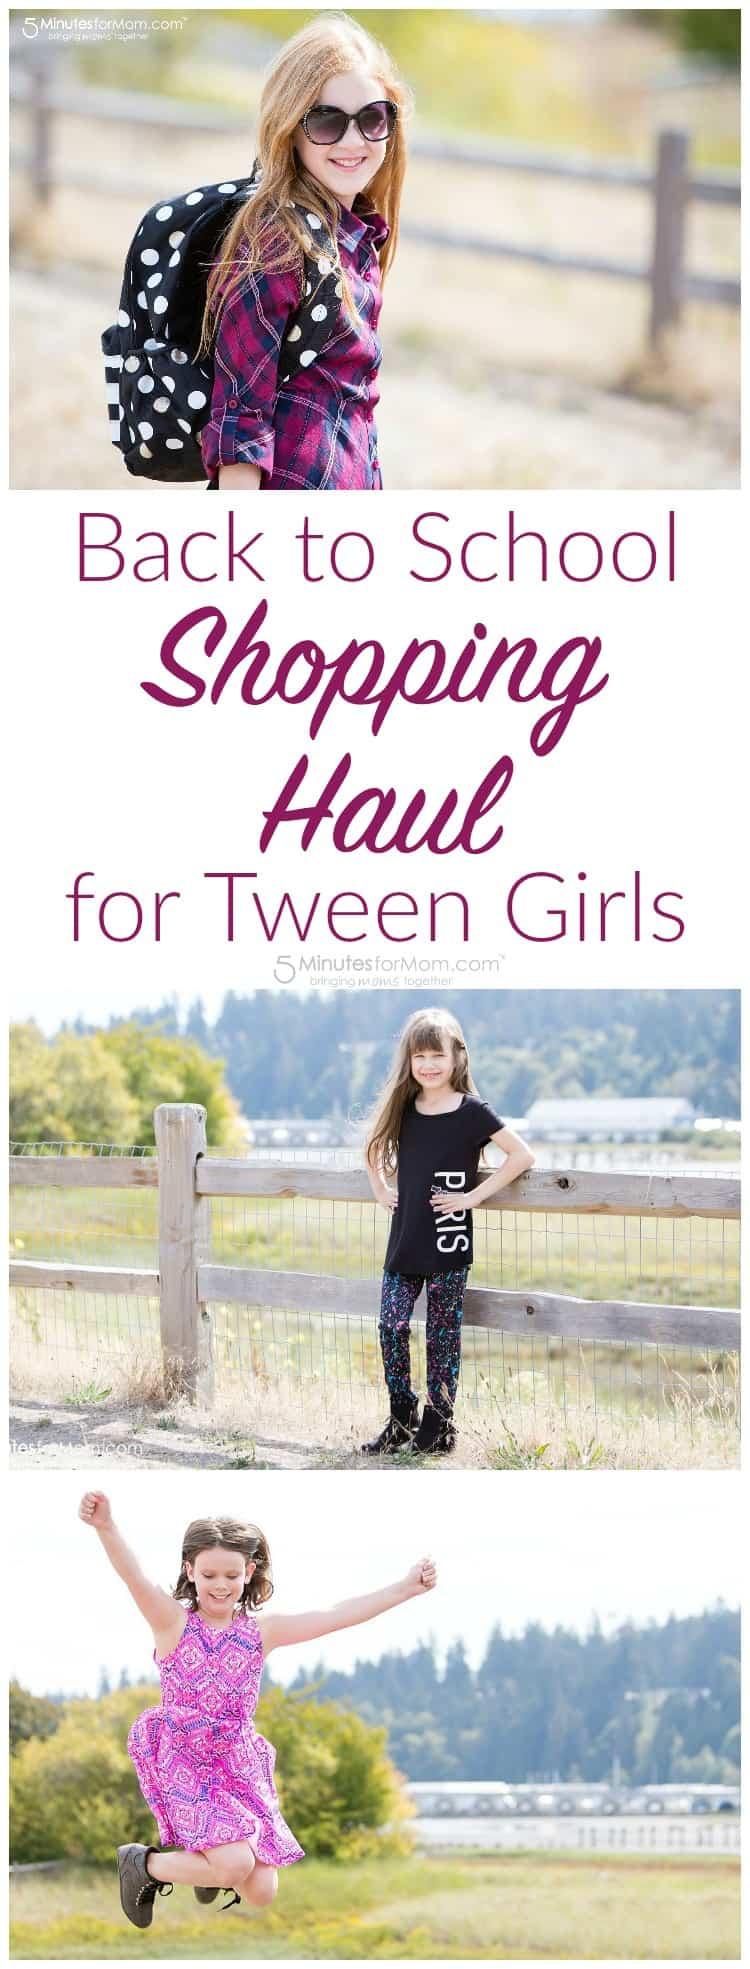 Back to School Shopping Haul for Tween Girls